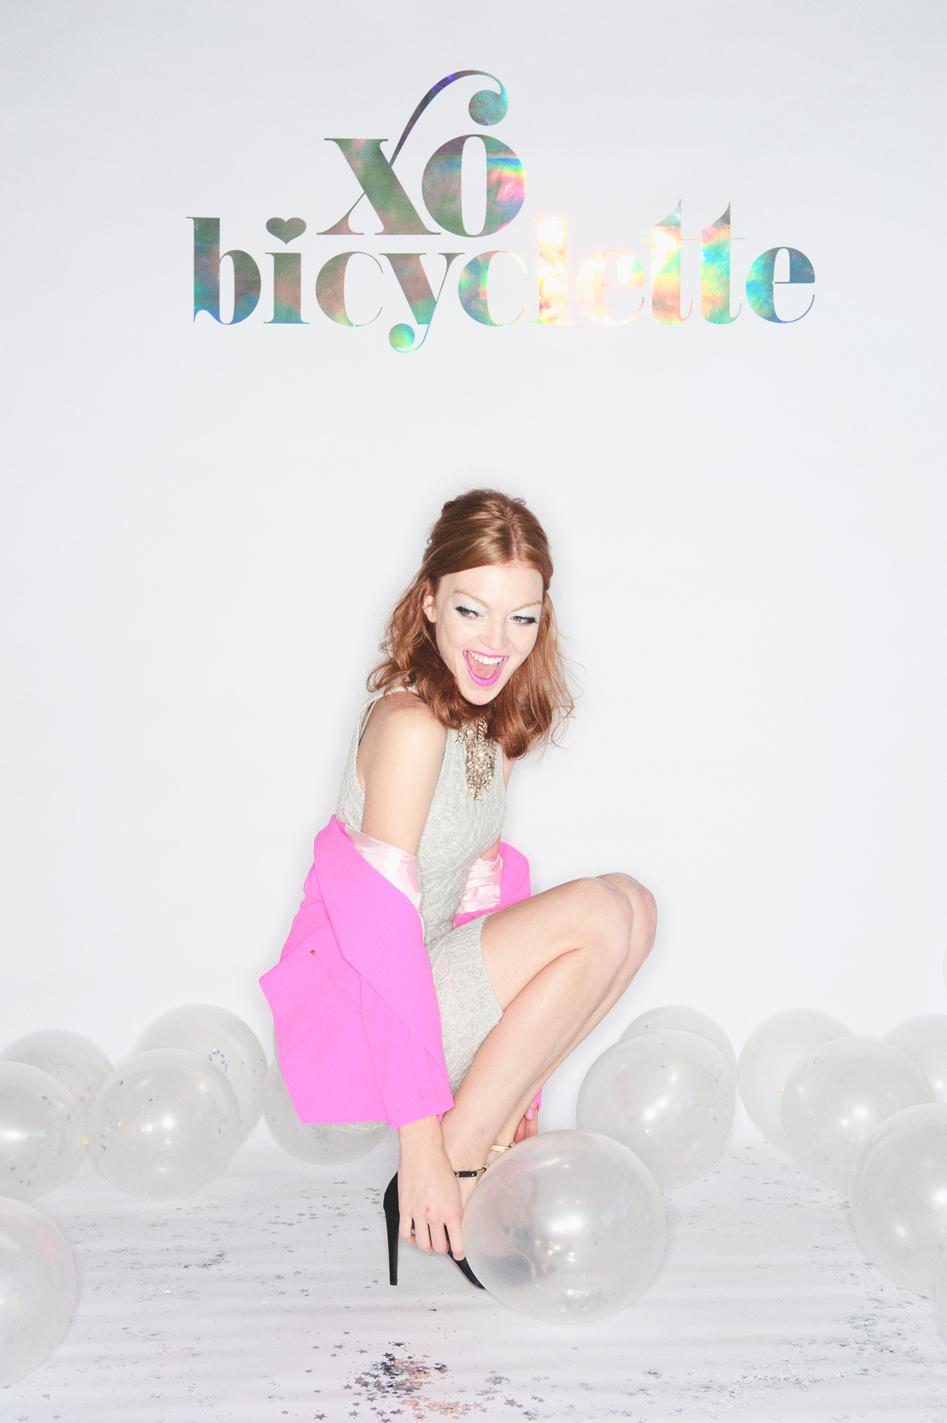 bicyclette_xo118.jpg